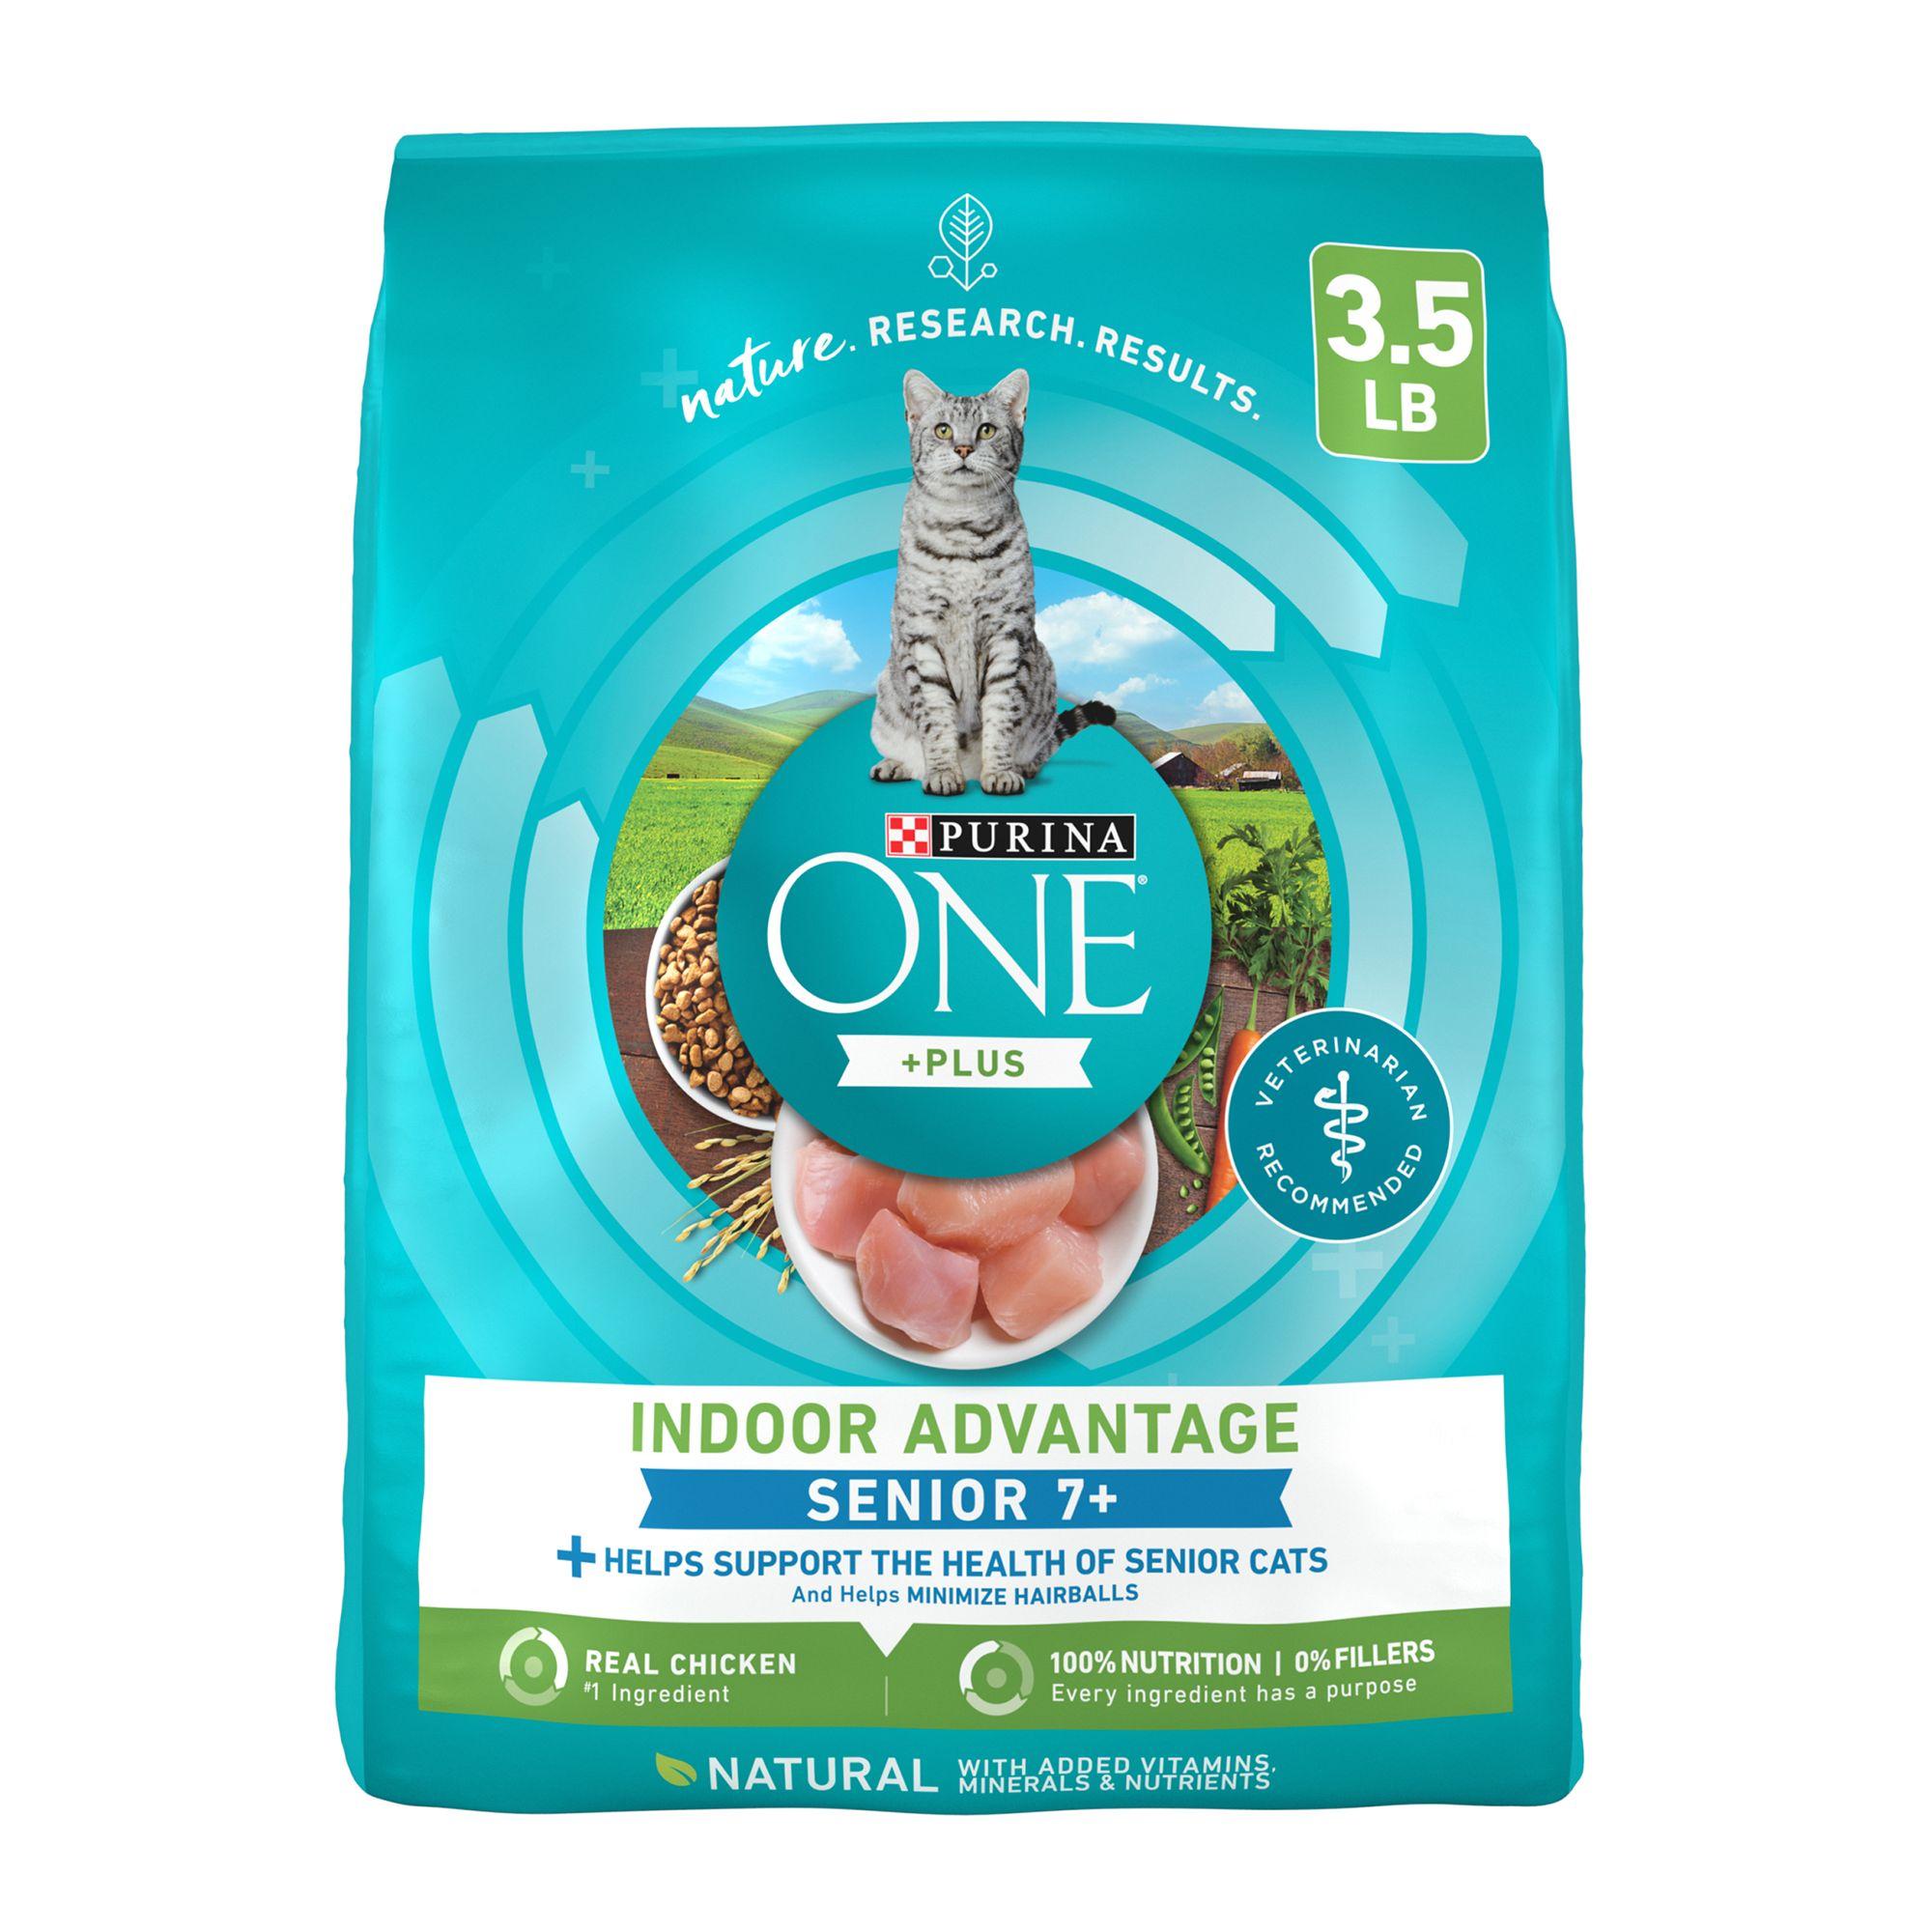 Purina Onereg Smartblendreg Vibrant Maturity Senior Cat Food Size 3.5 Lb